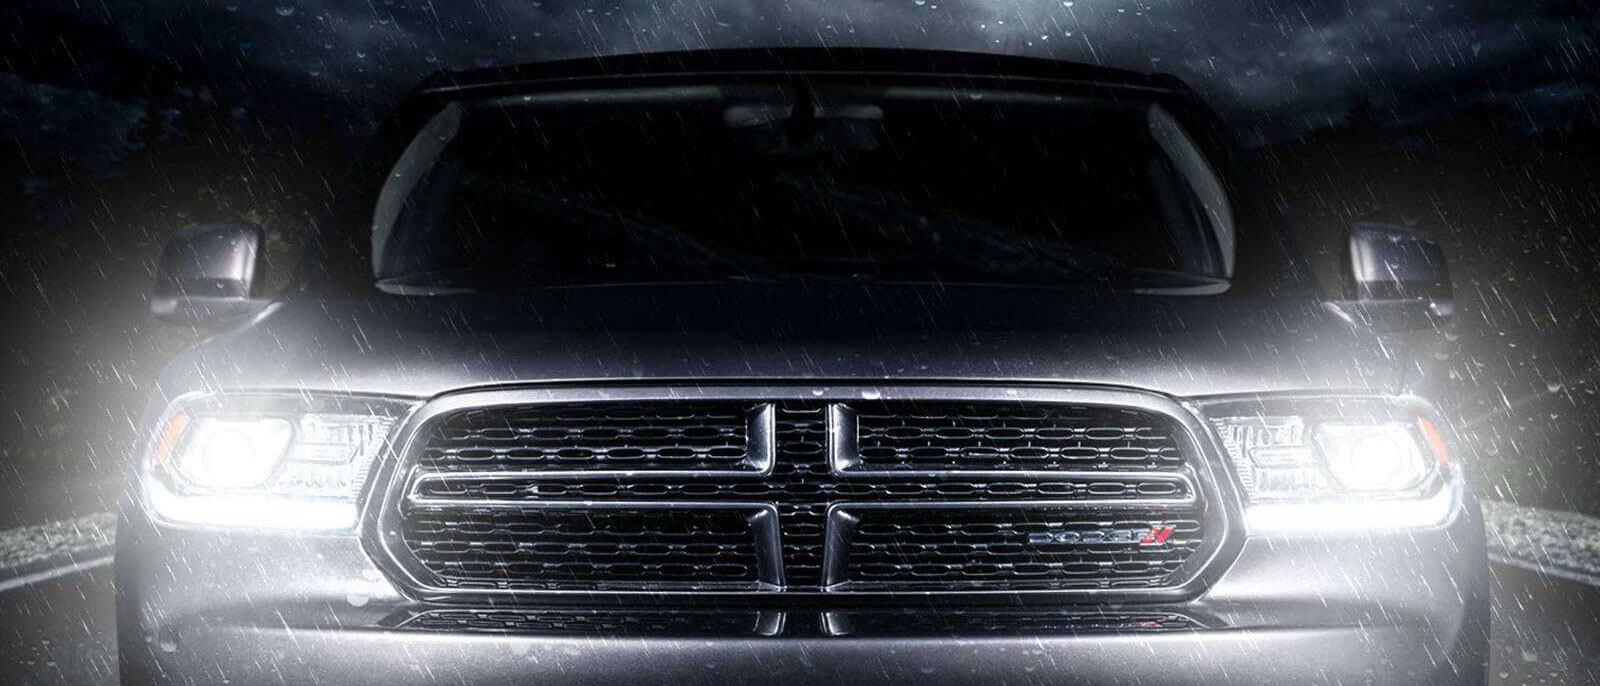 2016 Dodge Durango dramatic front view